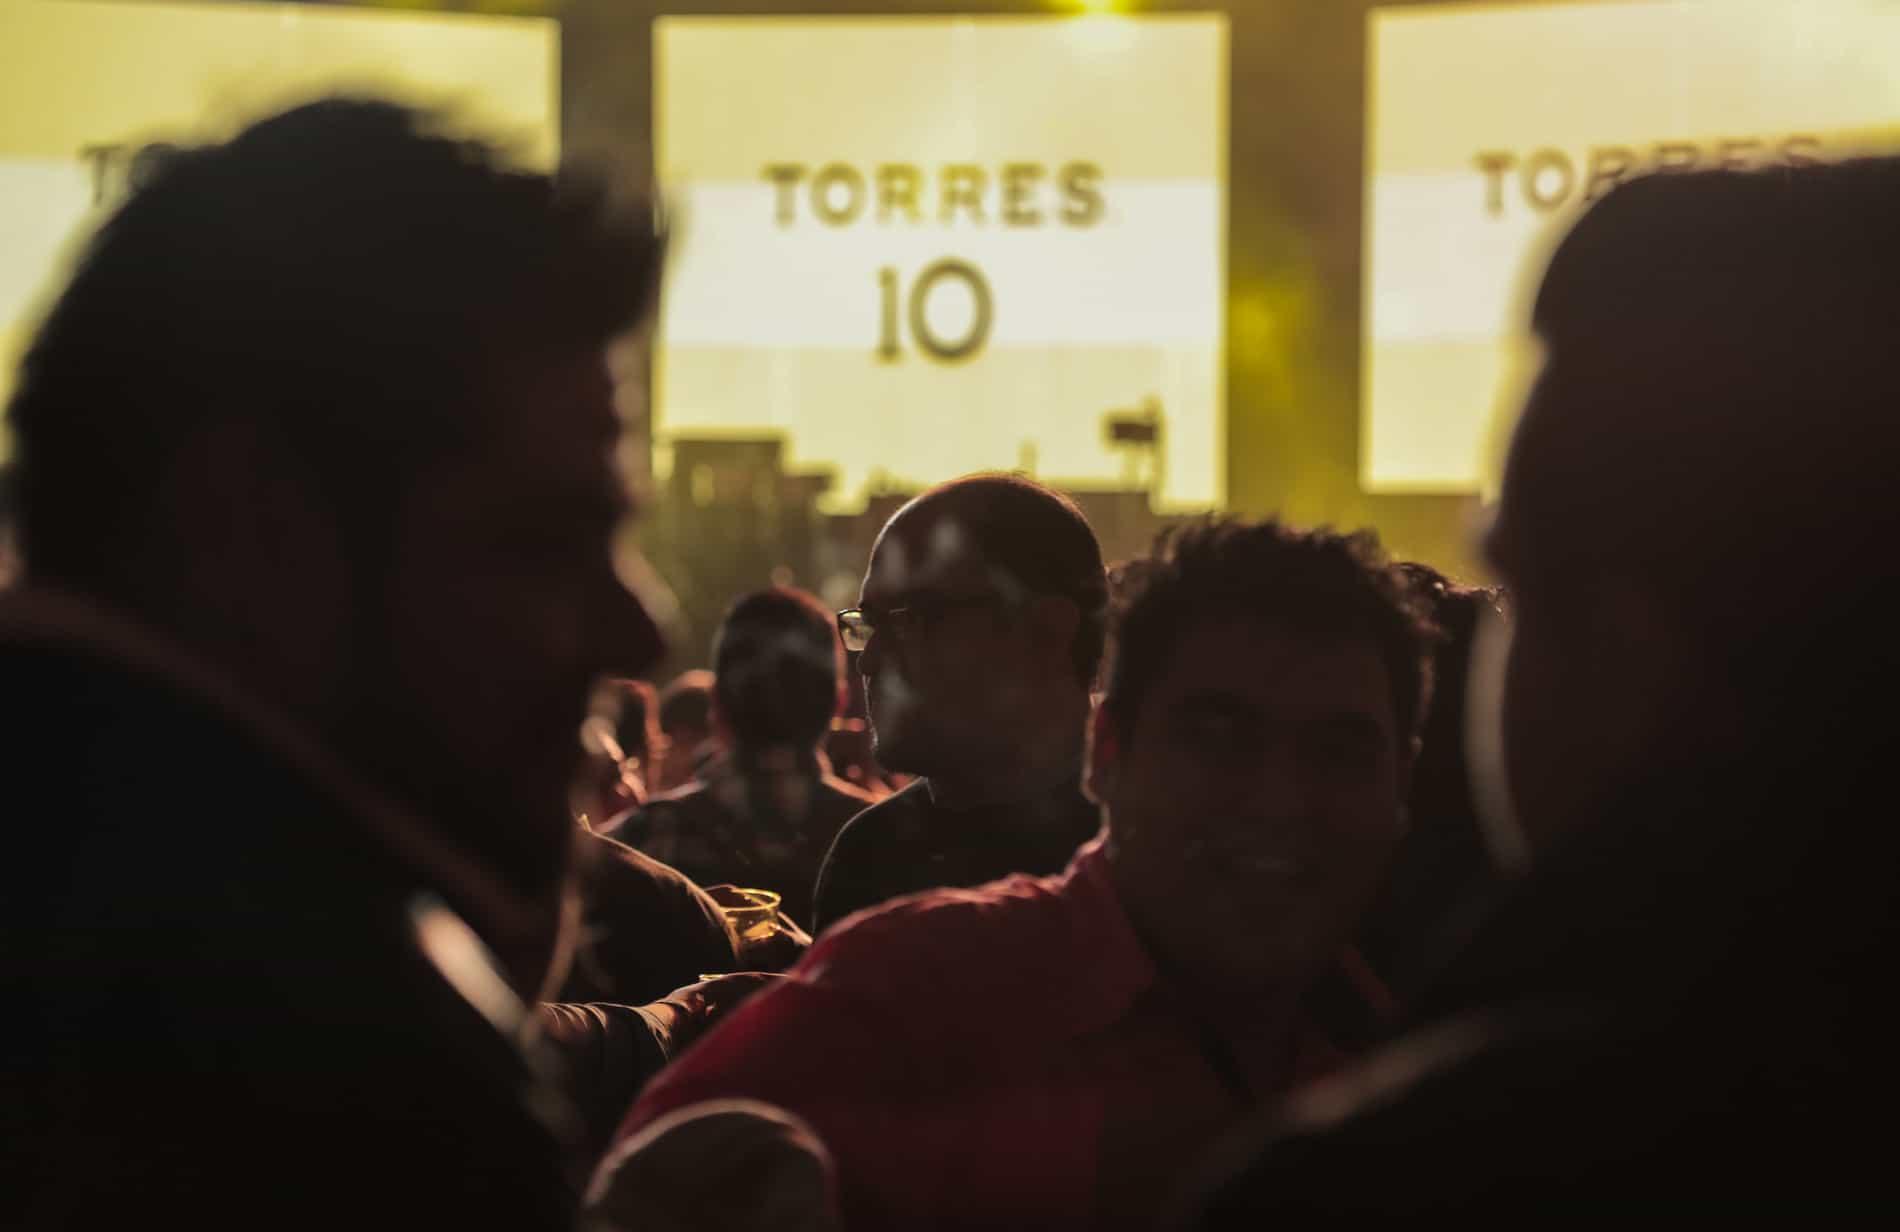 Torres 10 festejó el 10 del 10